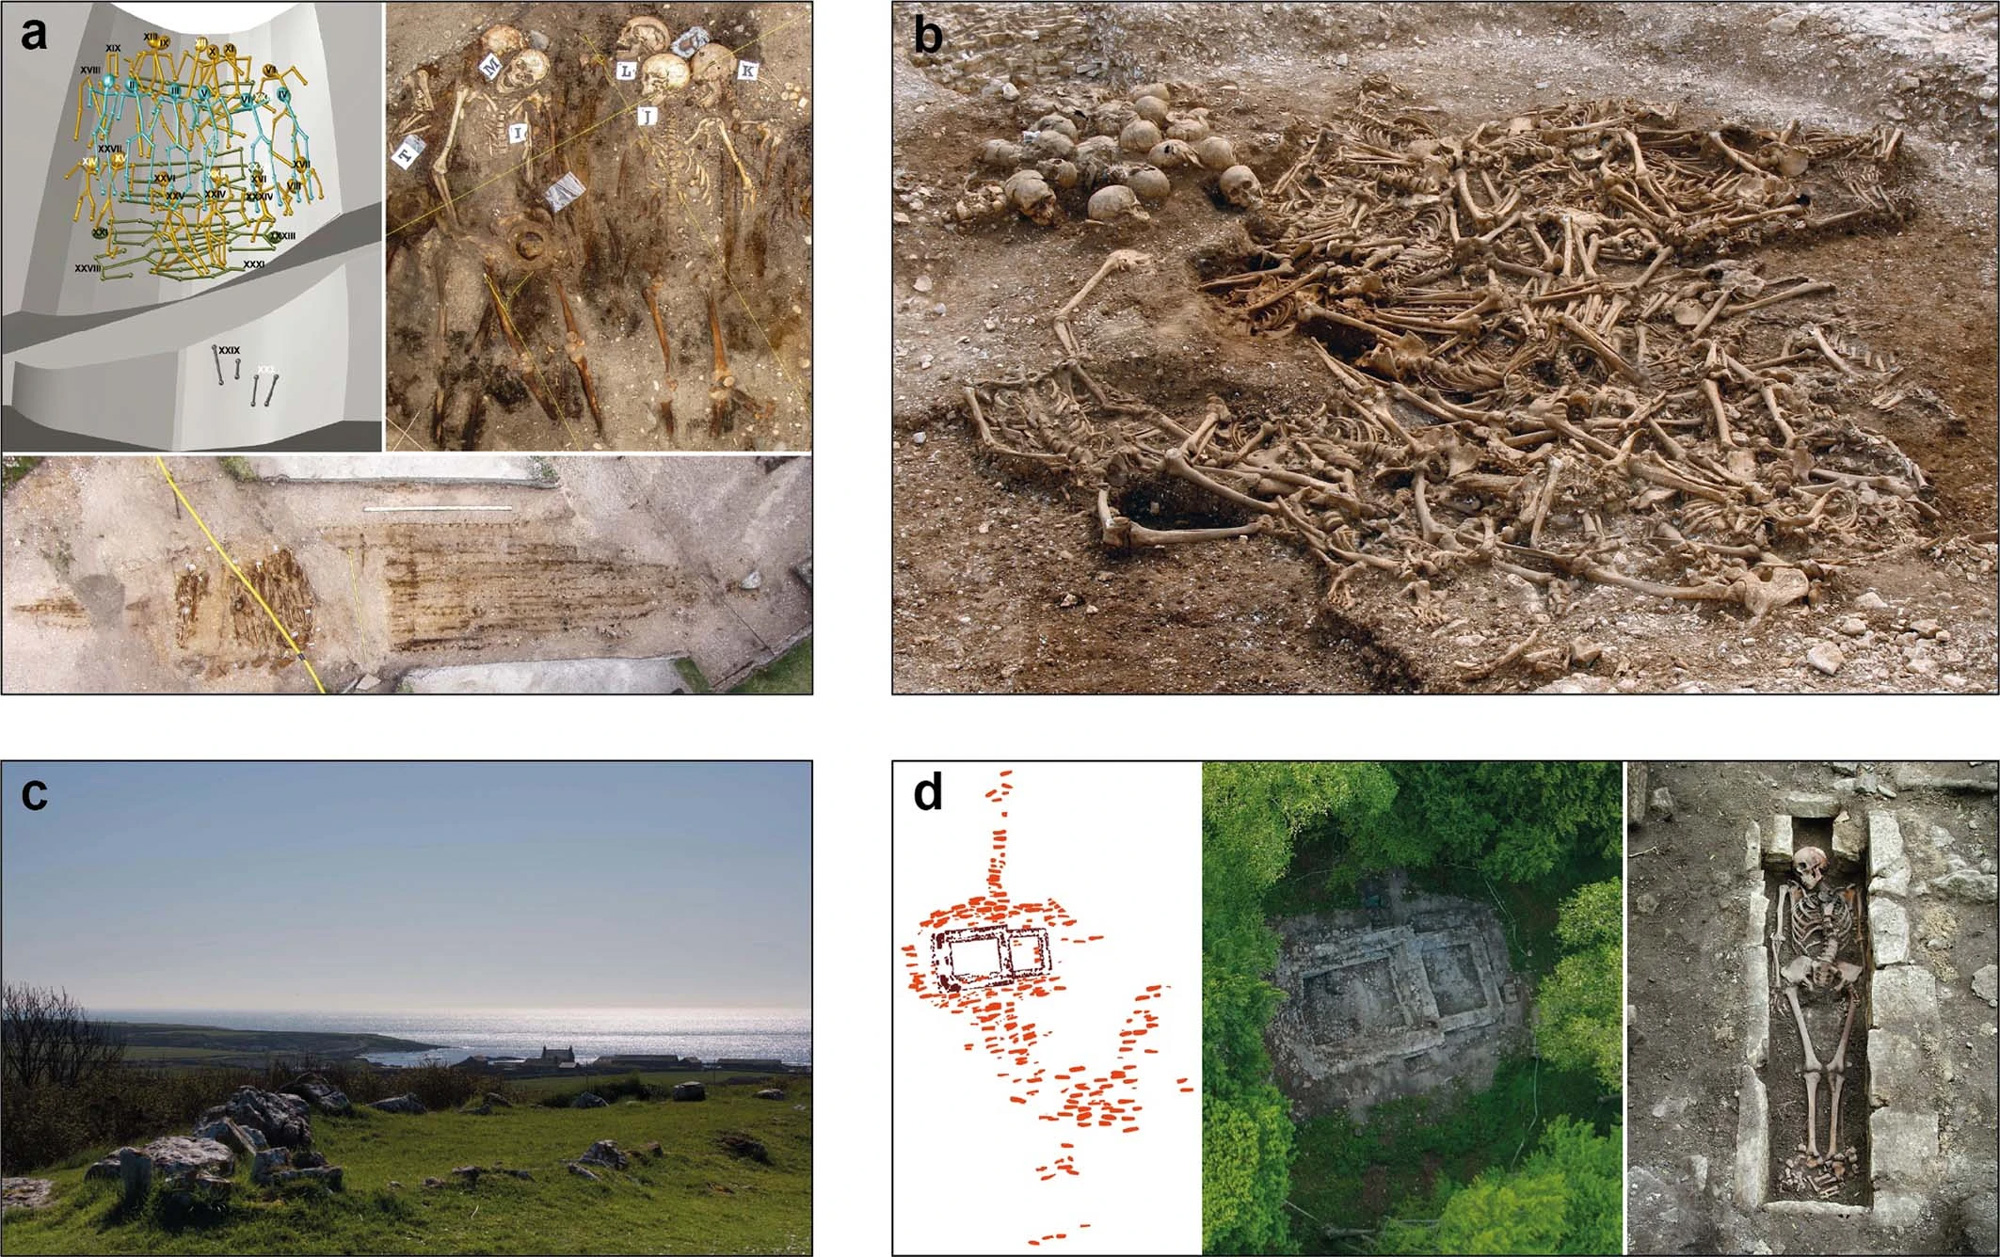 https://elementy.ru/images/news/paleogenomics_of_the_viking_world_1_2000.jpg